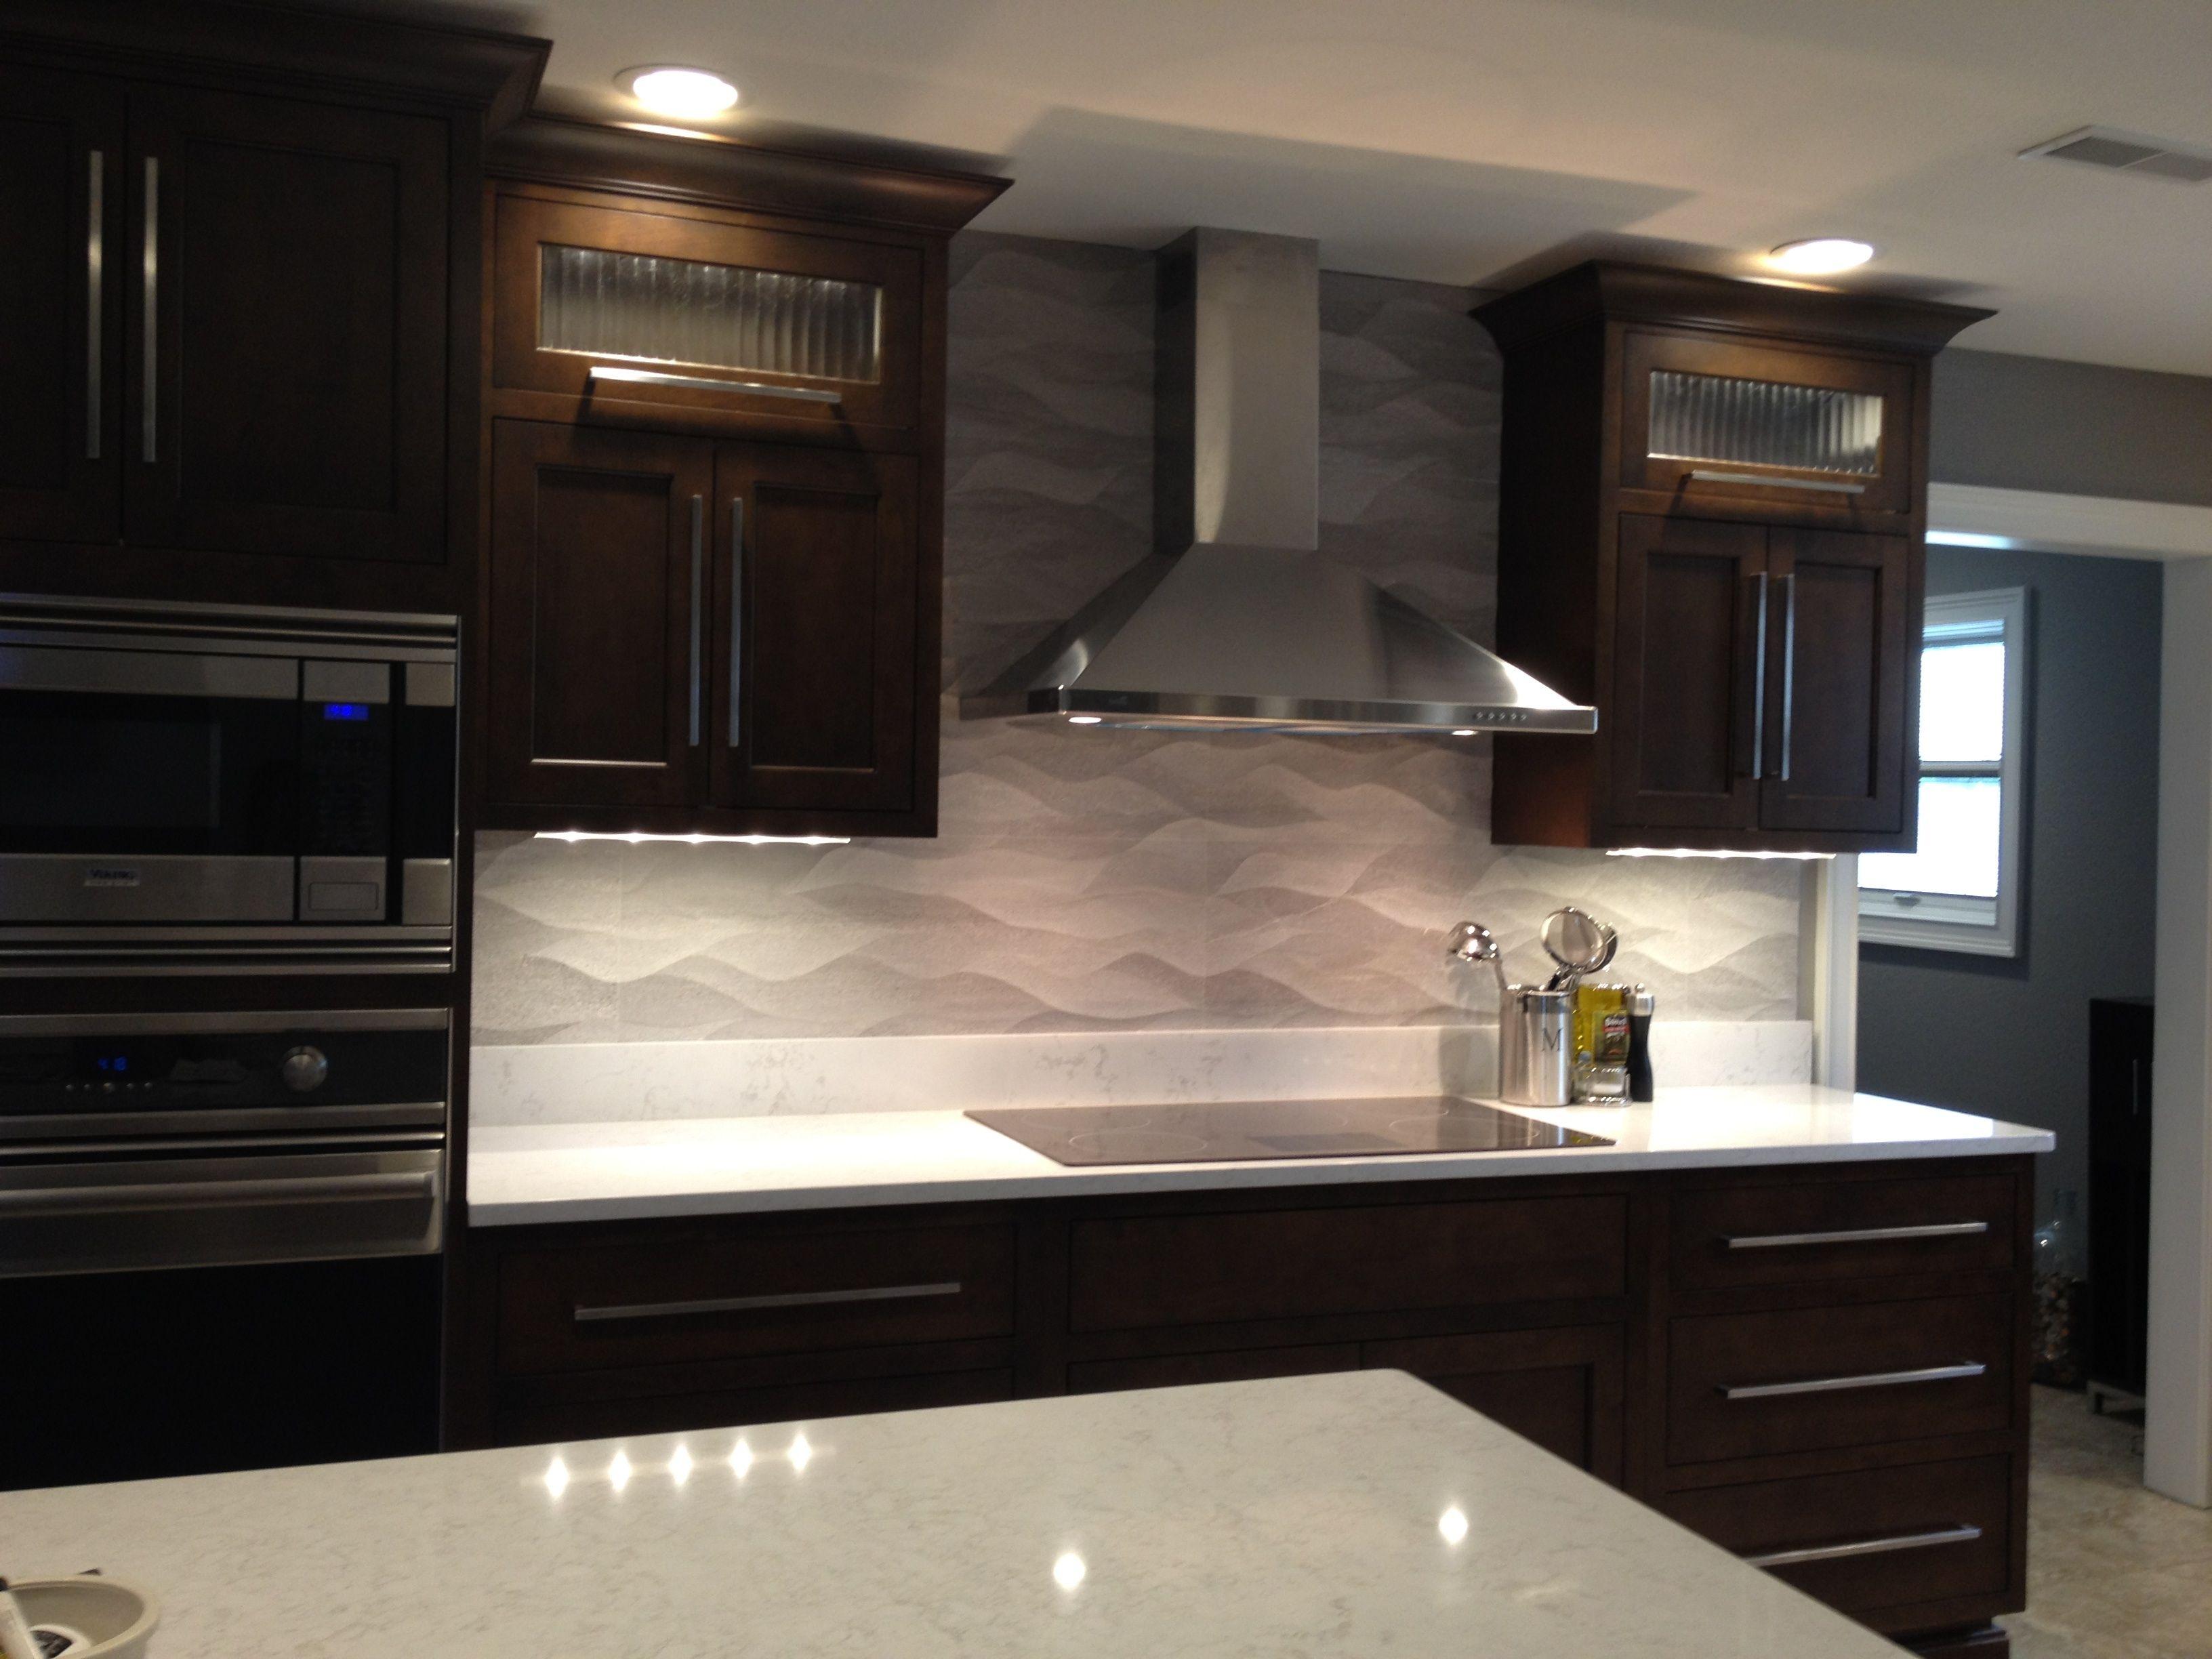 Enjoyable Remodeled Kitchen Wavy Porcelanosa Backsplash Ge Monogram Home Interior And Landscaping Spoatsignezvosmurscom